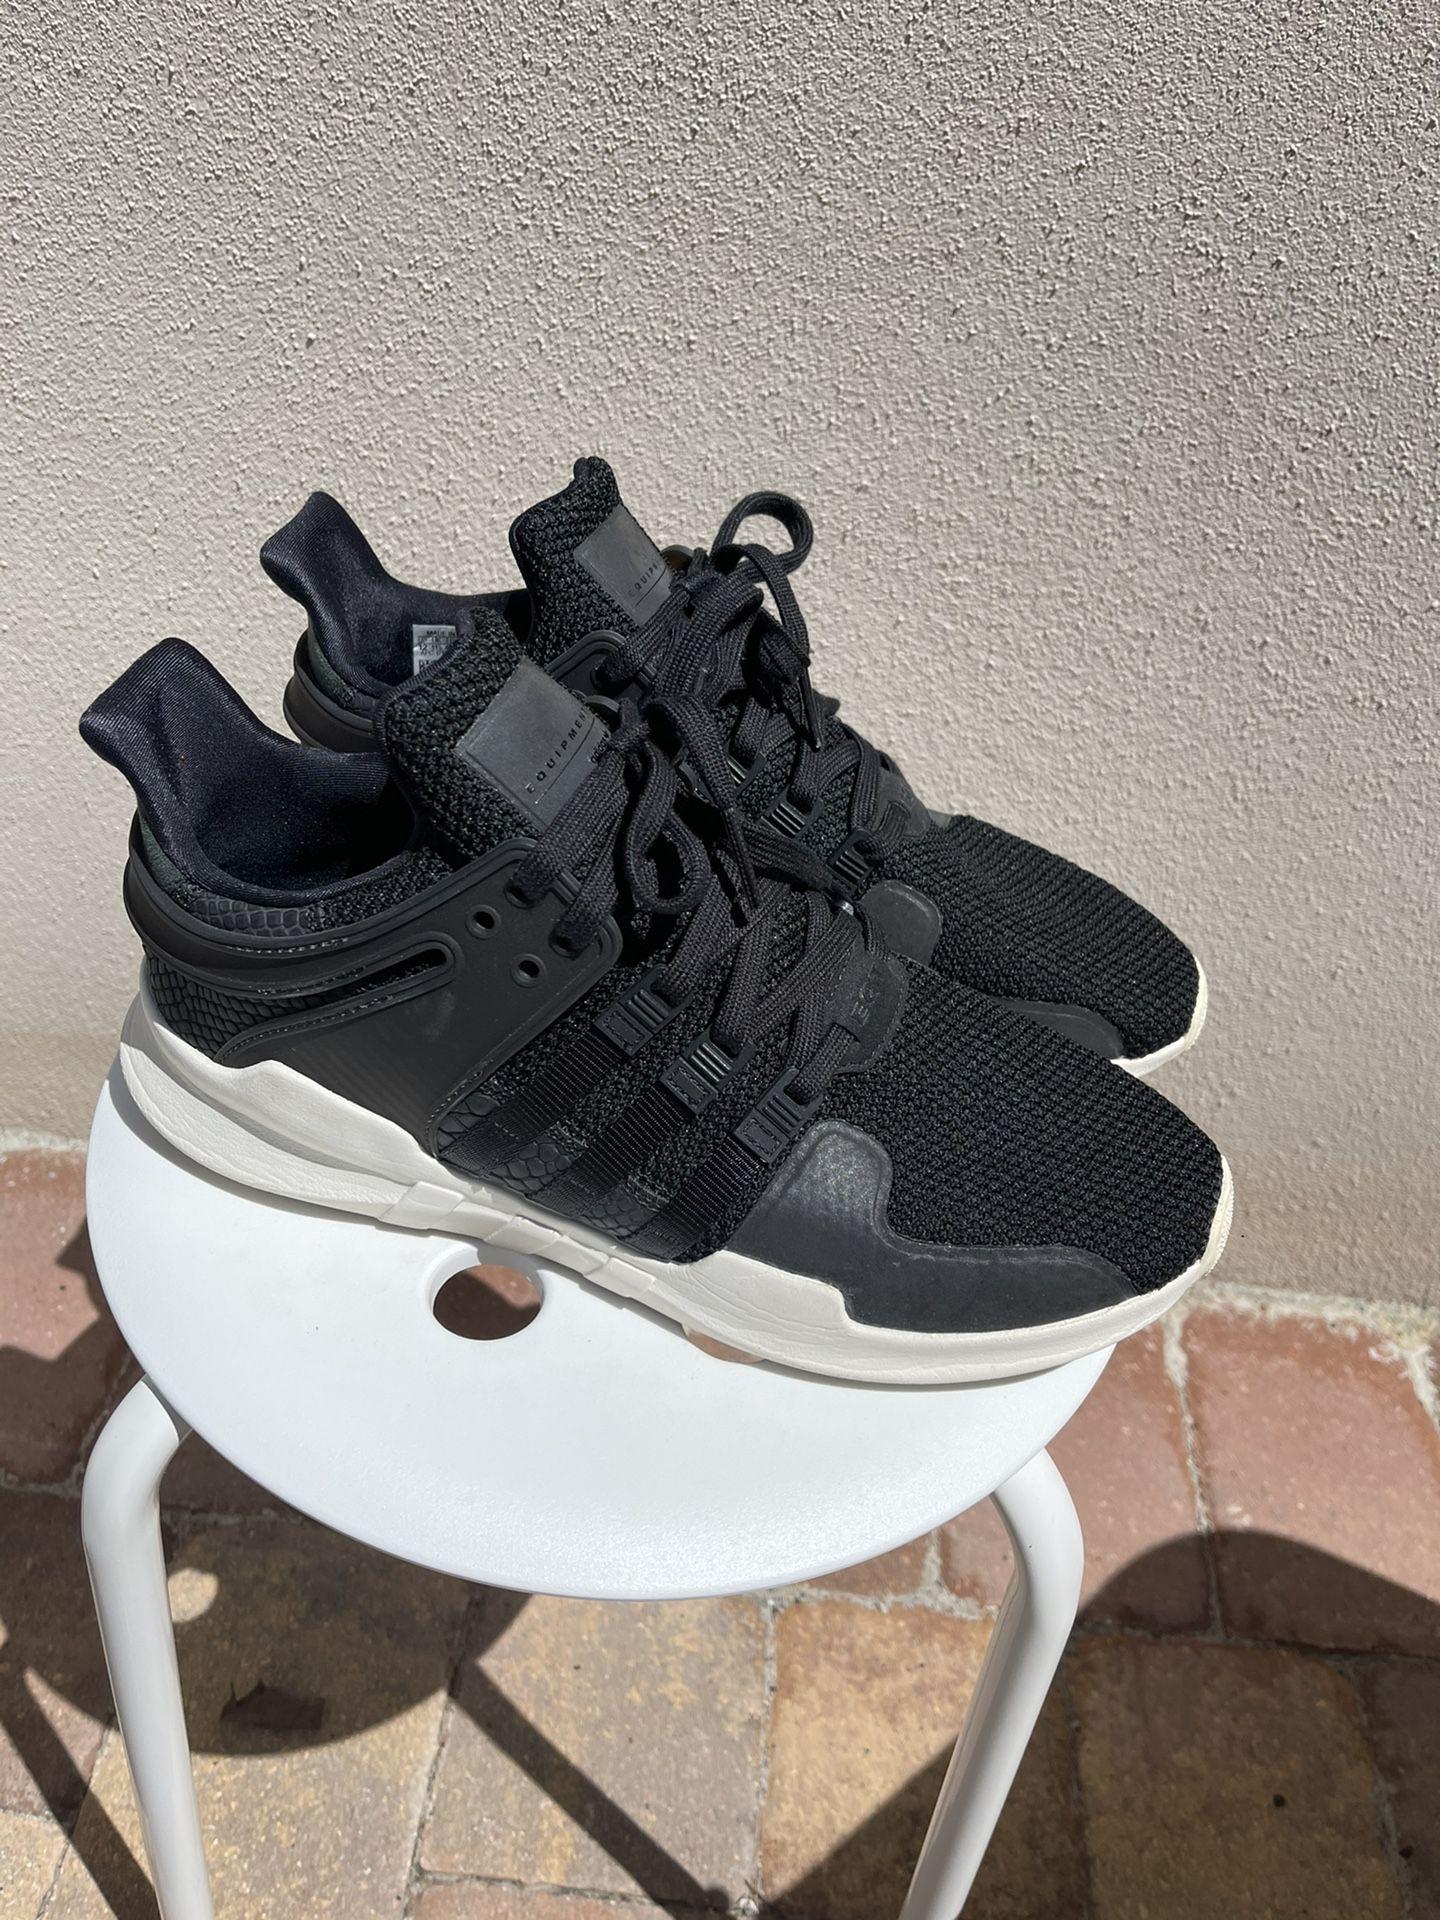 Adidas Size 12 $50